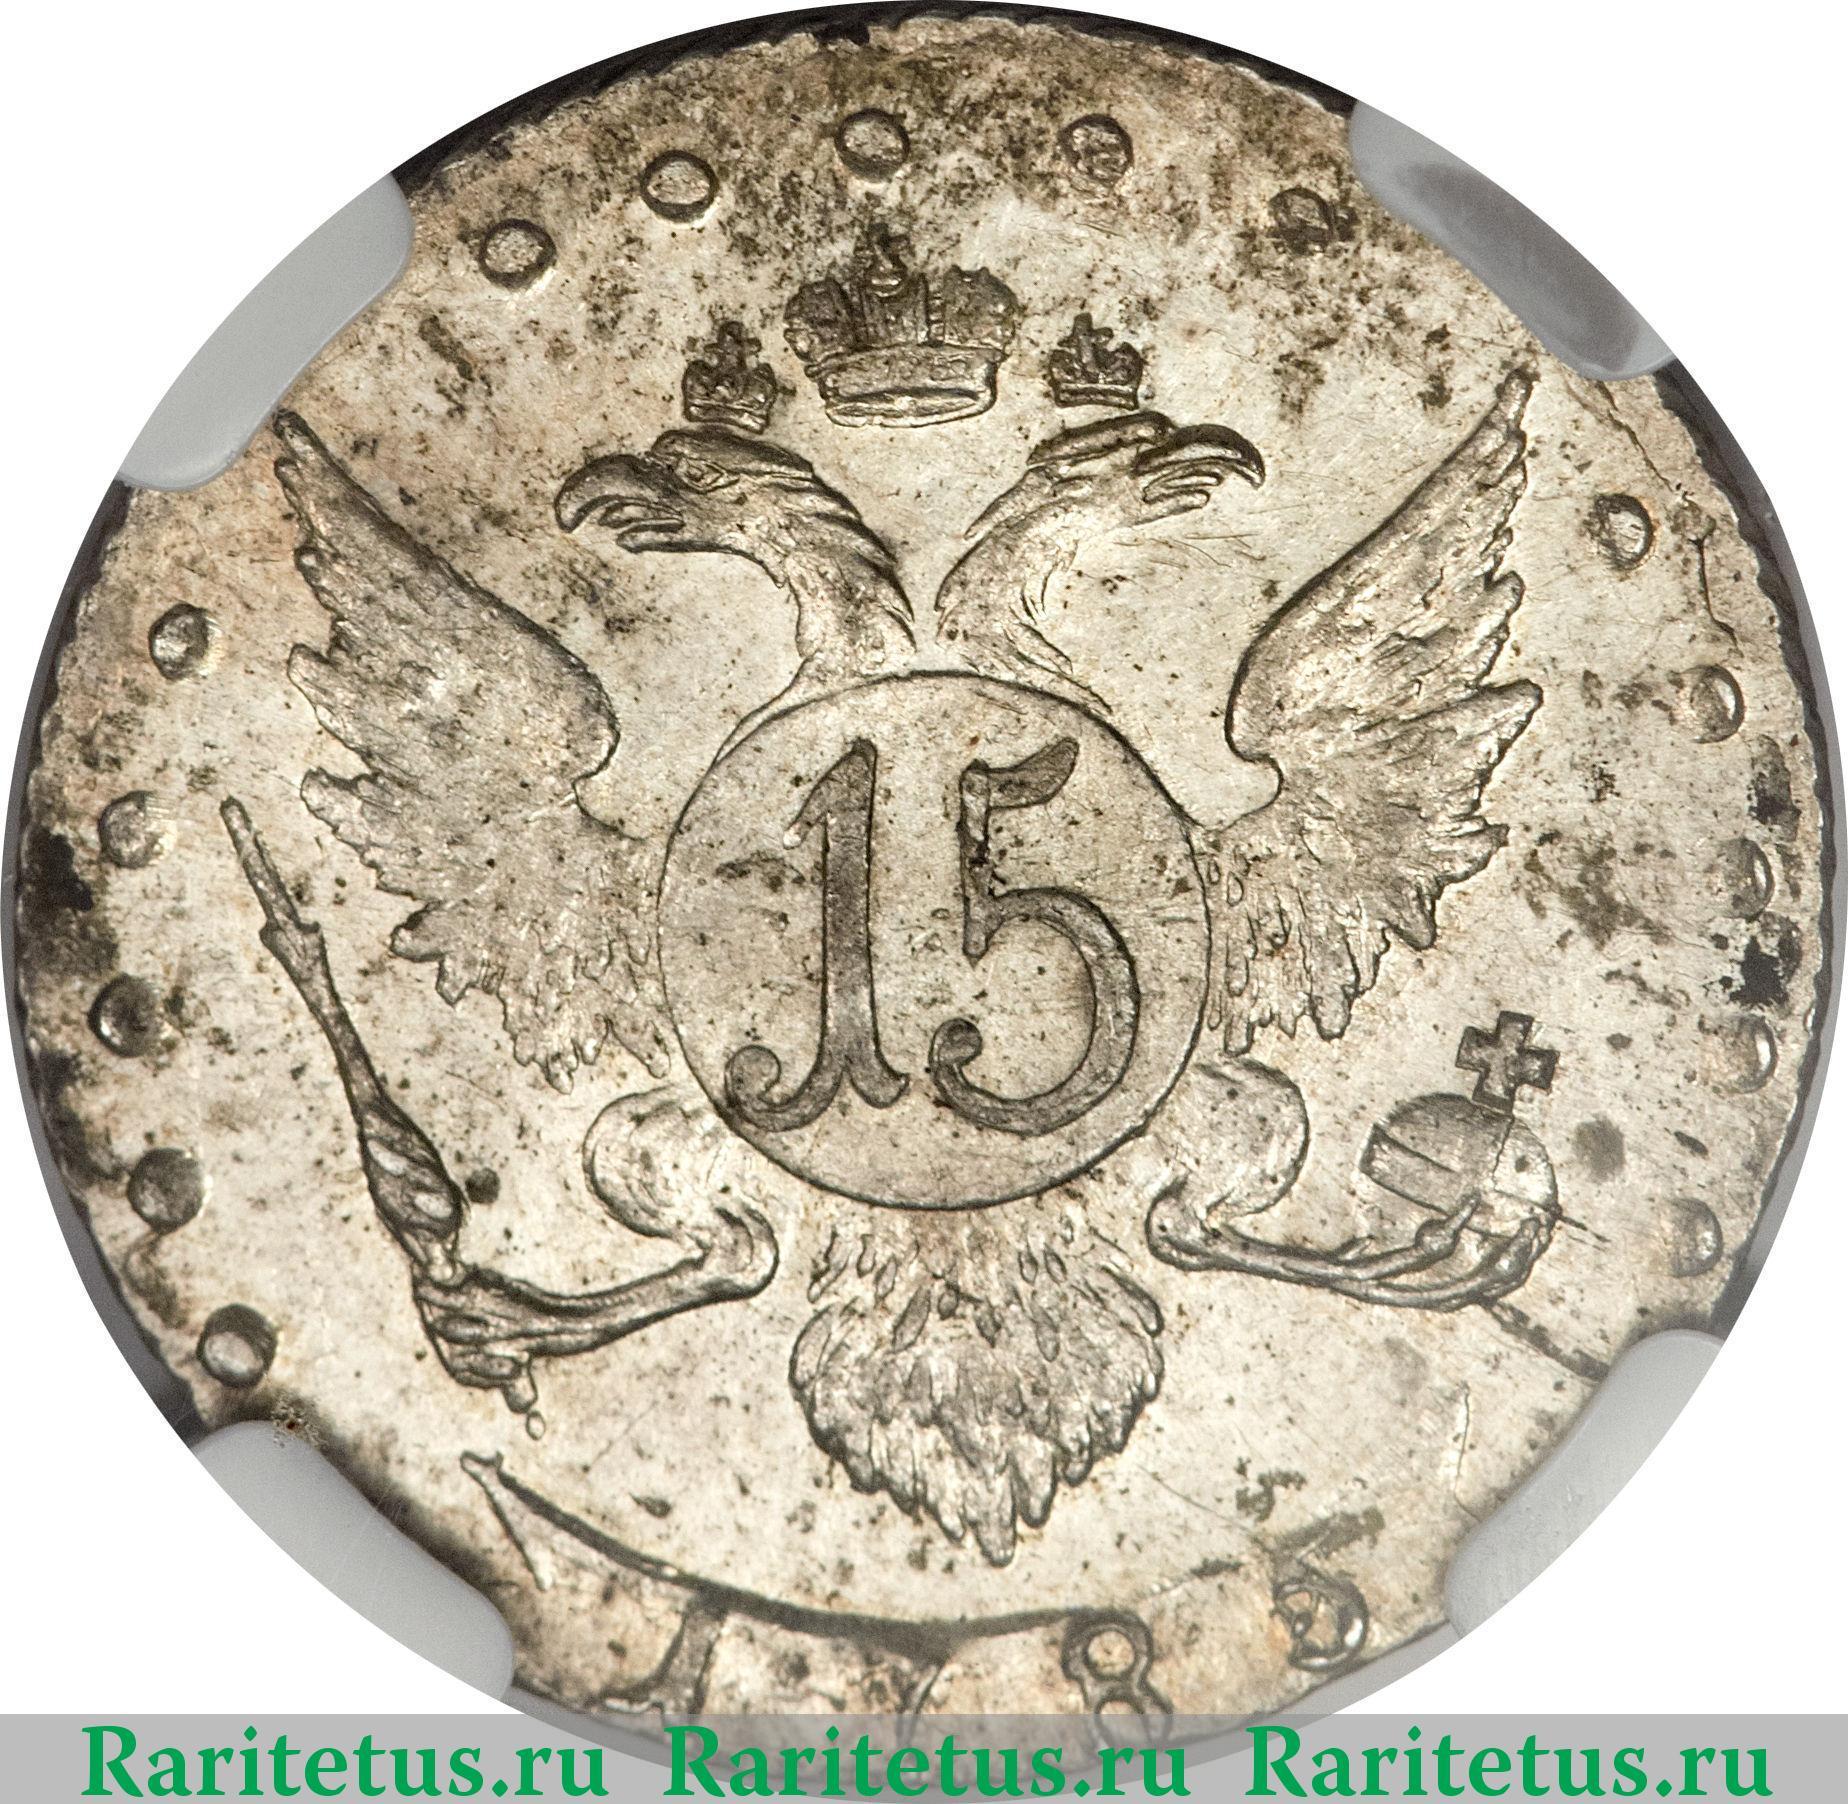 15 копеек 1787 года цена